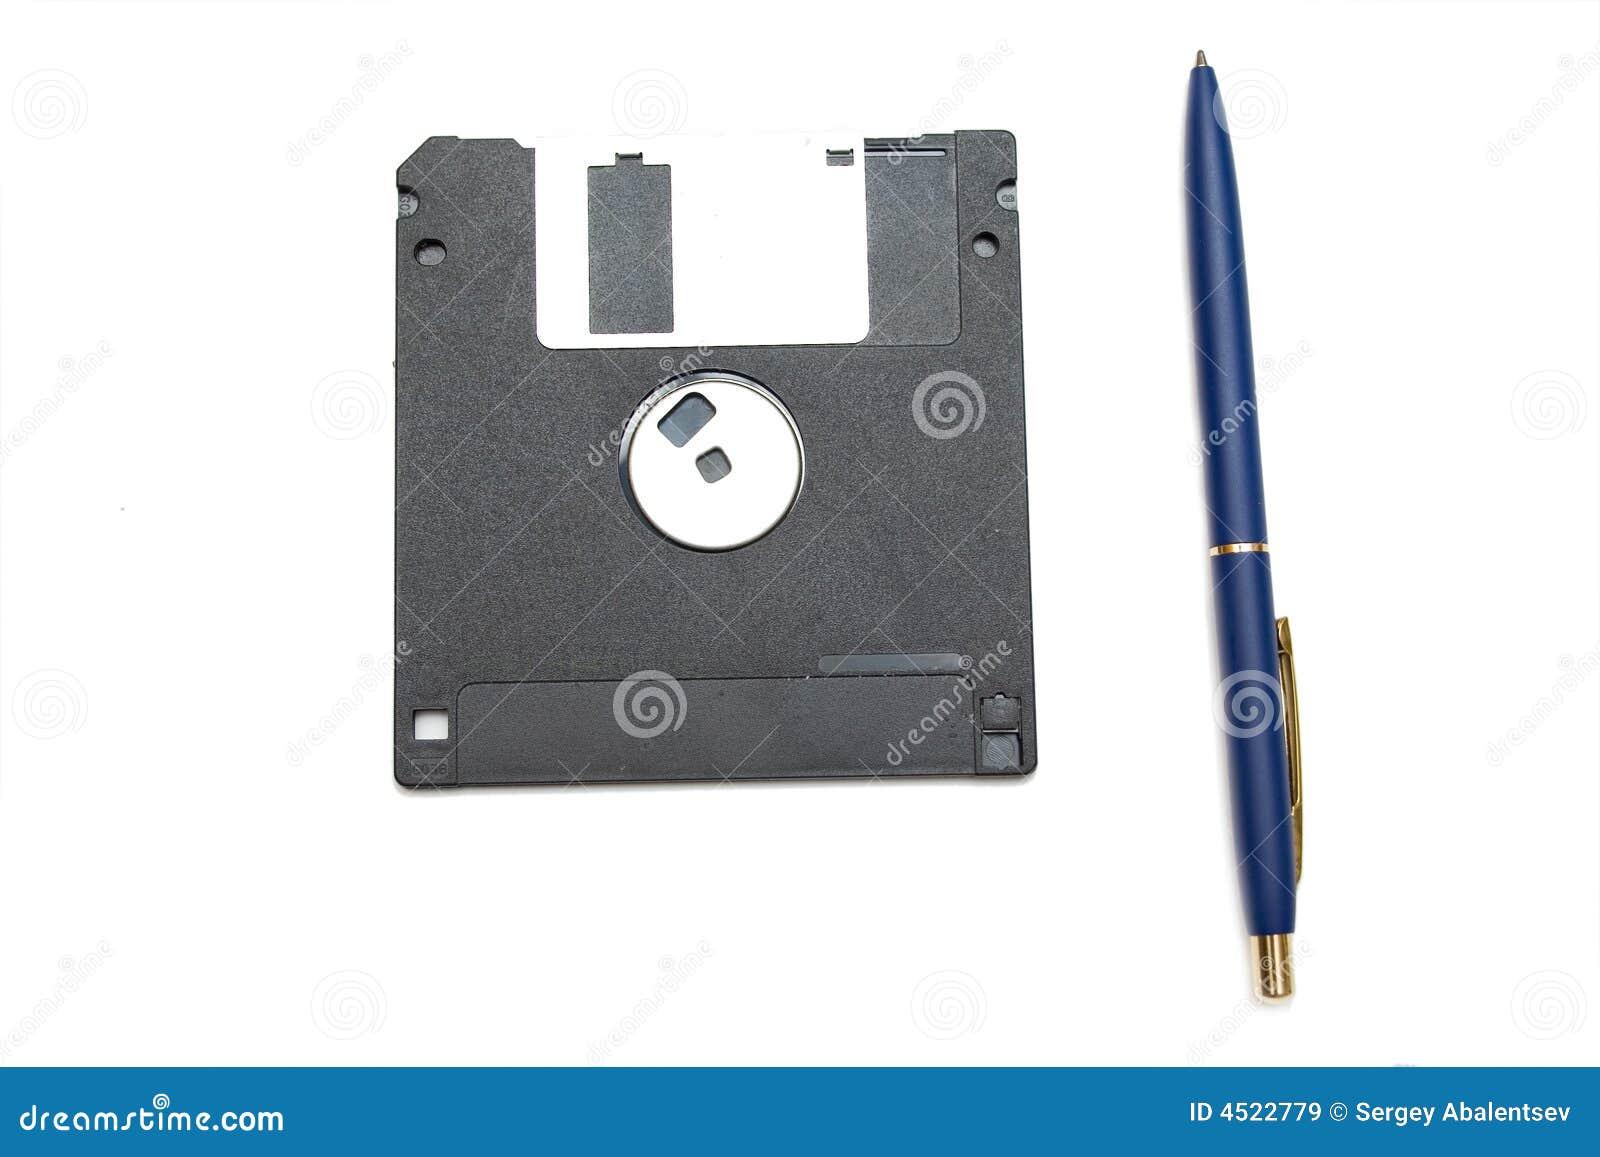 Pena e diskett azuis